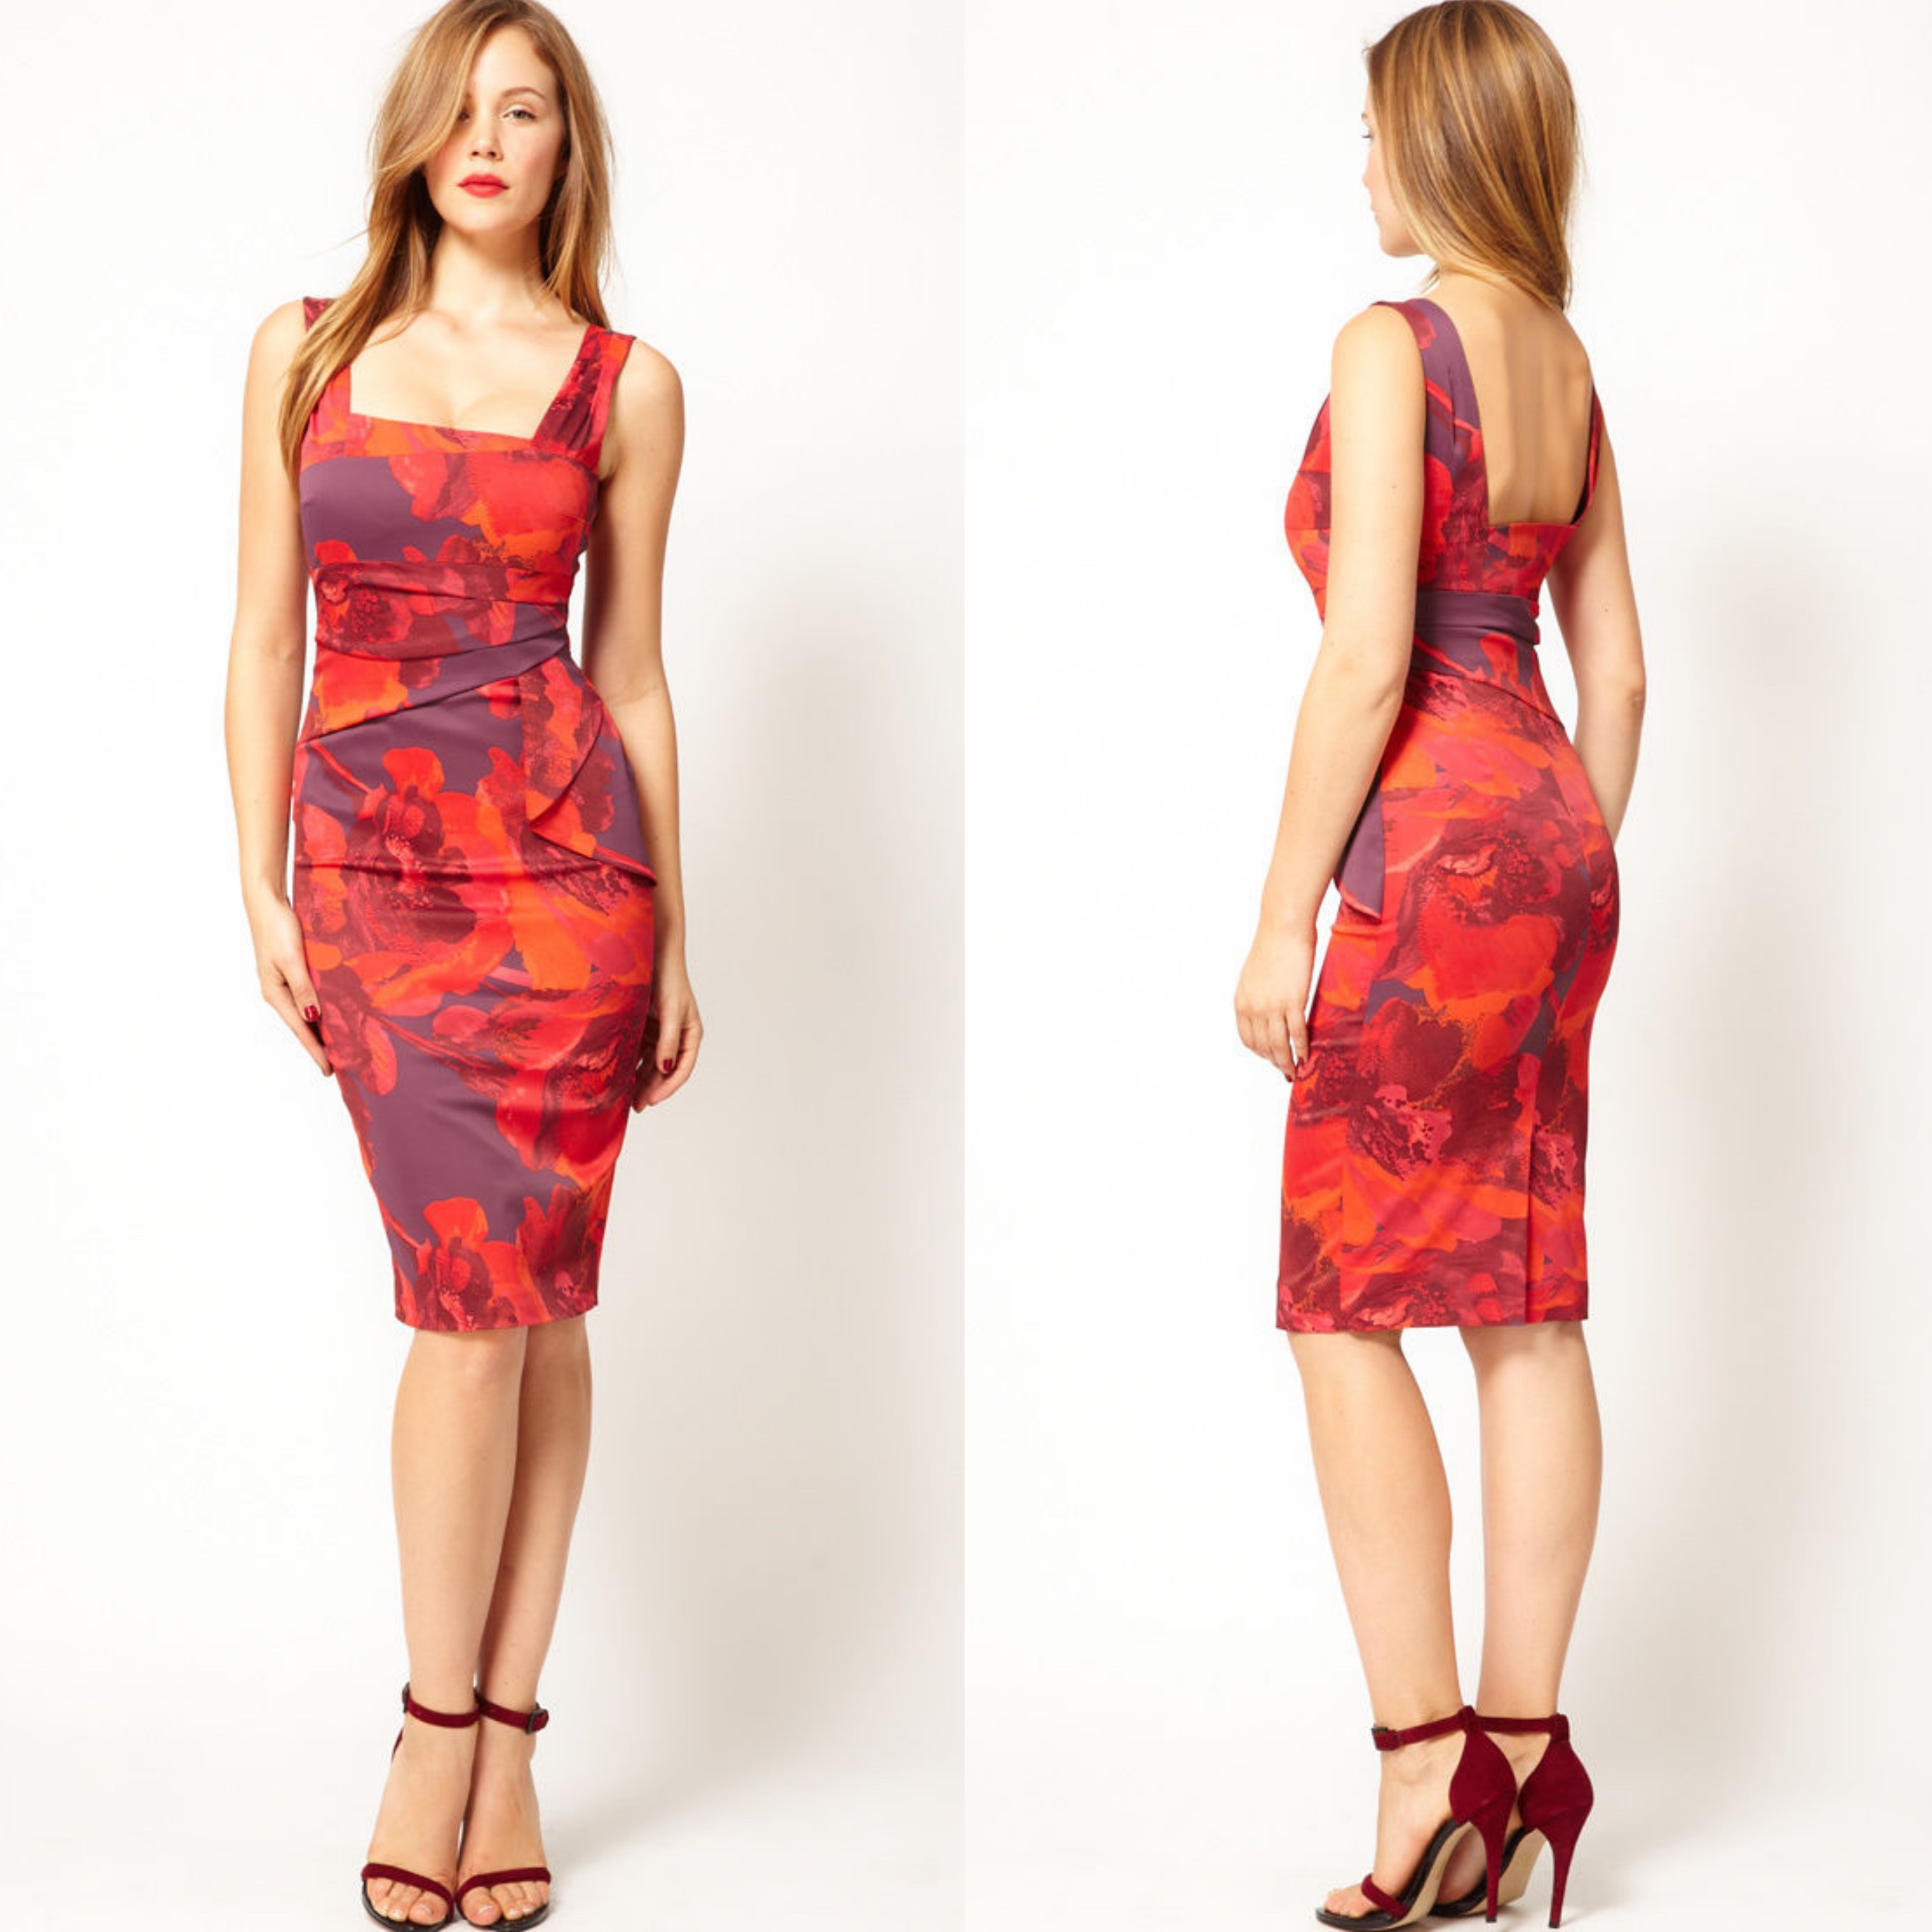 a9dc87a58bd New Karen Millen Dress Floral Print Satin Bodycon Pencil Red Purple ...